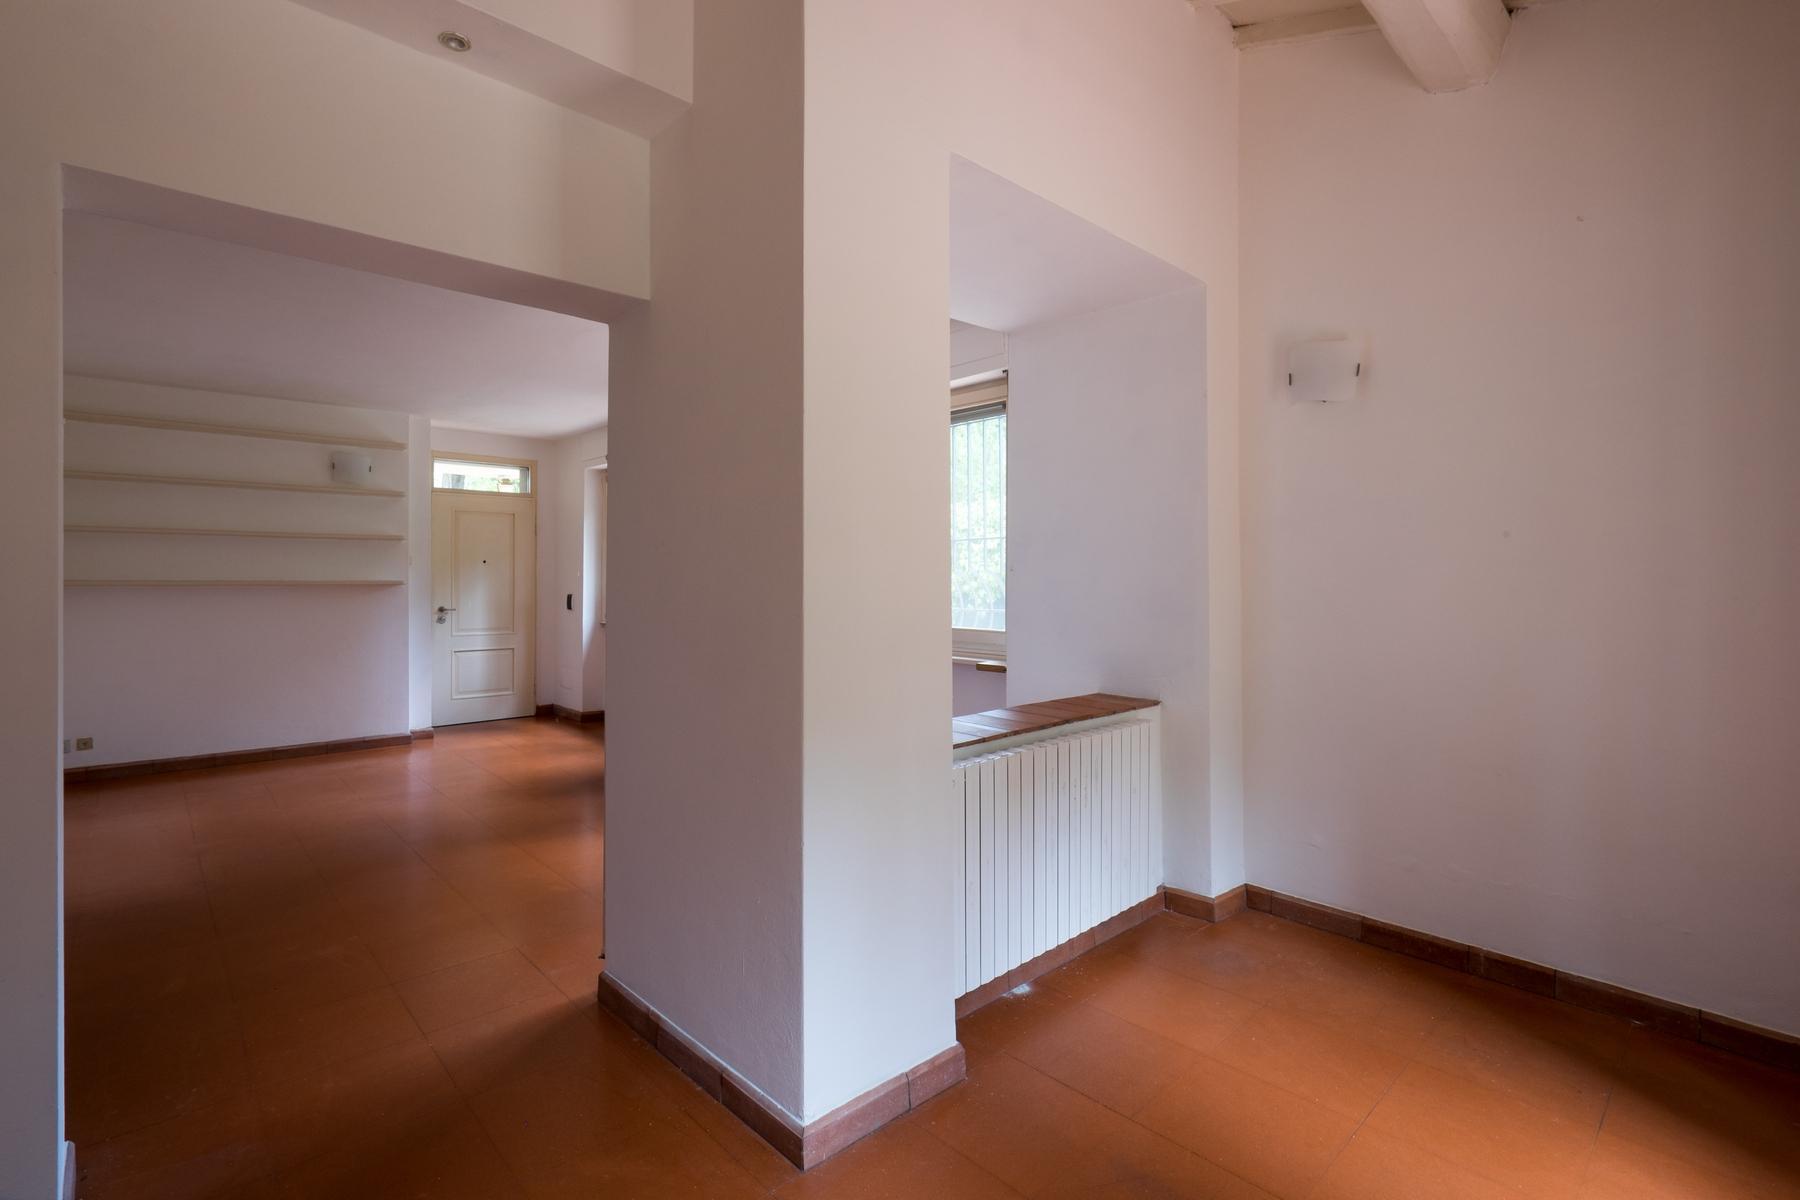 Lovely apartment in exclusive Poggio Imperiale area - 5